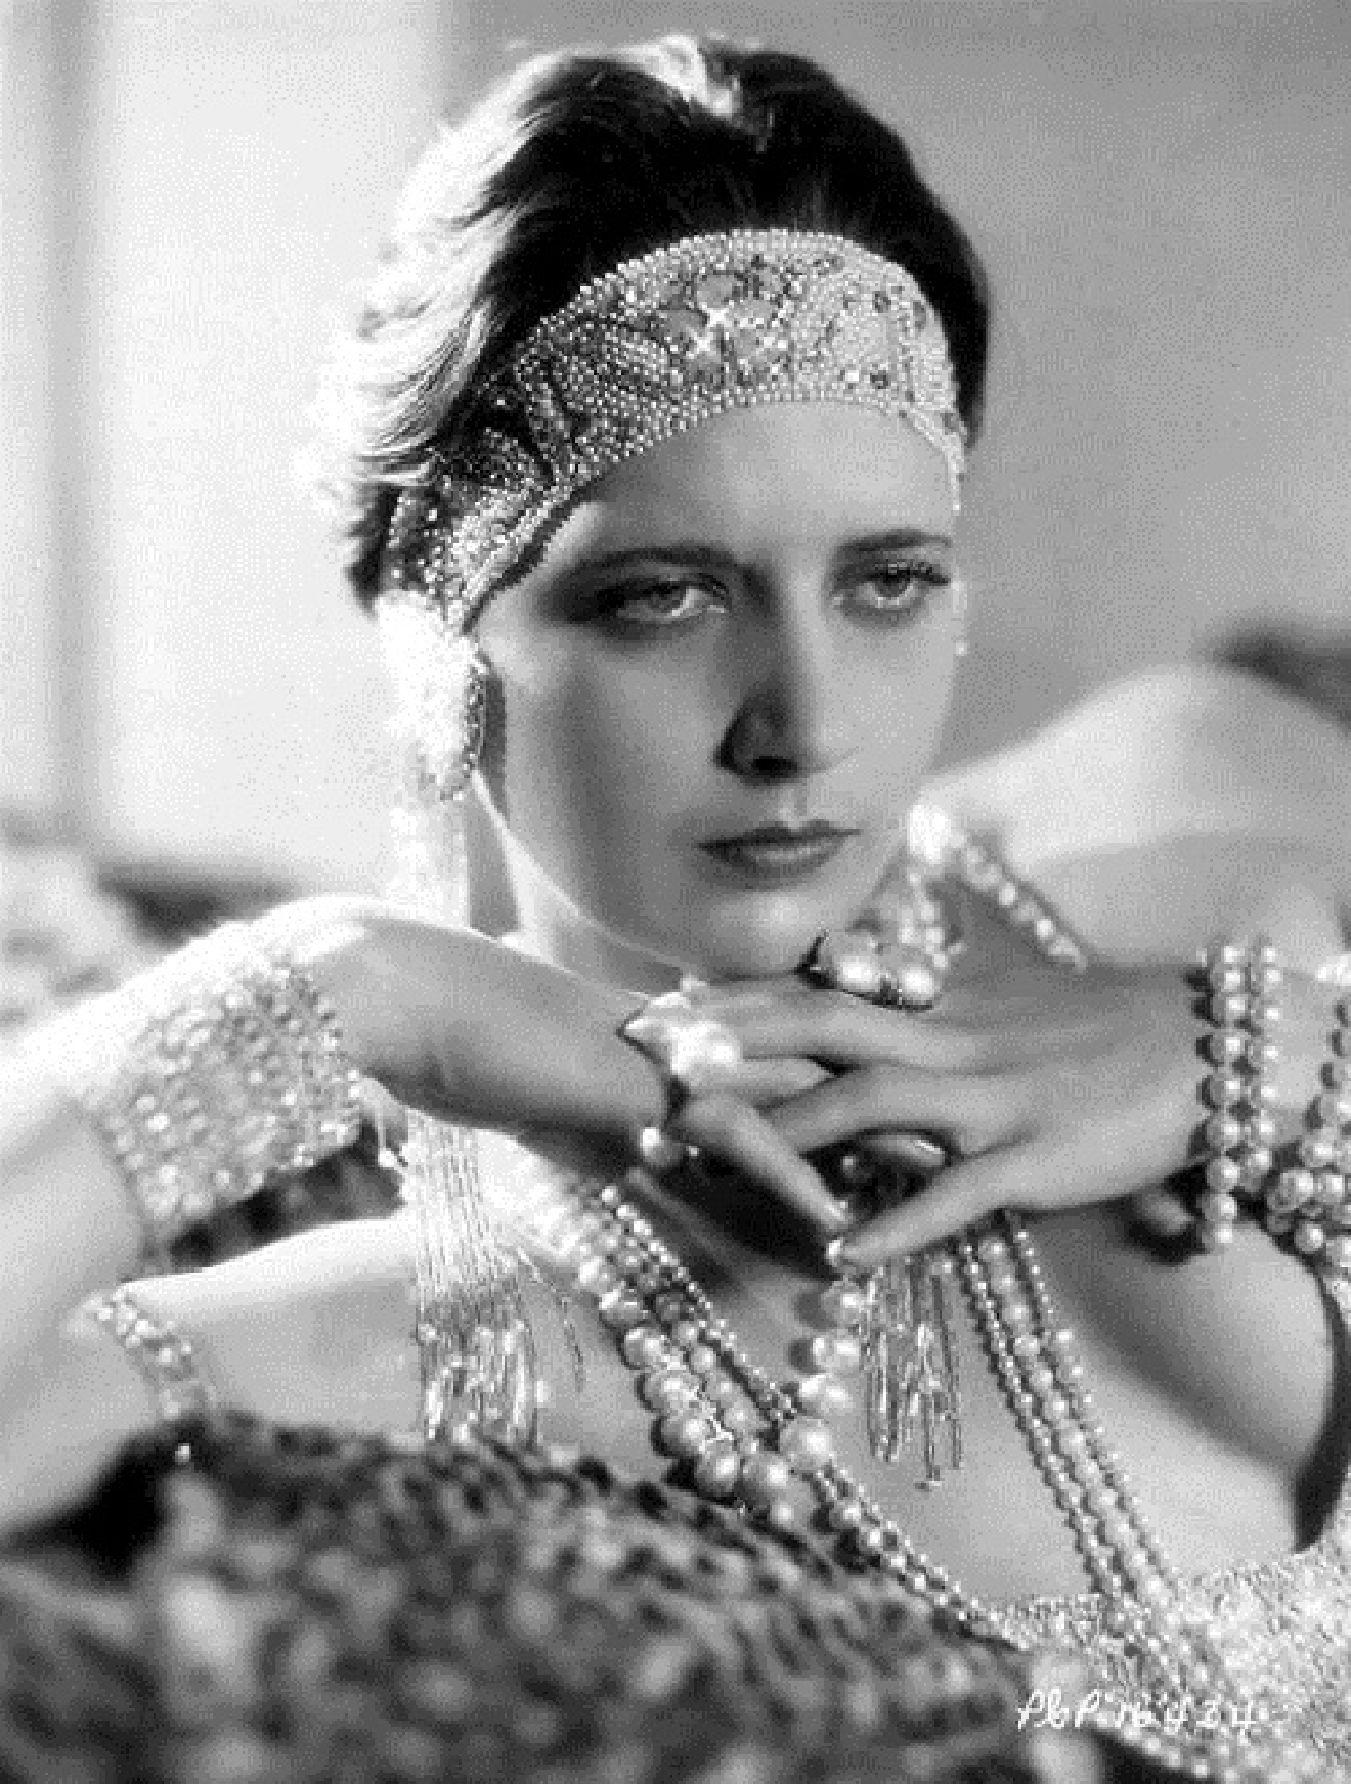 Julie Christie (born 1940 (born in Chabua, India),Ahney Her Sex pics & movies Liza Snyder,Errol Flynn (1909?959 (born in Tasmania and later naturalized American citizen)